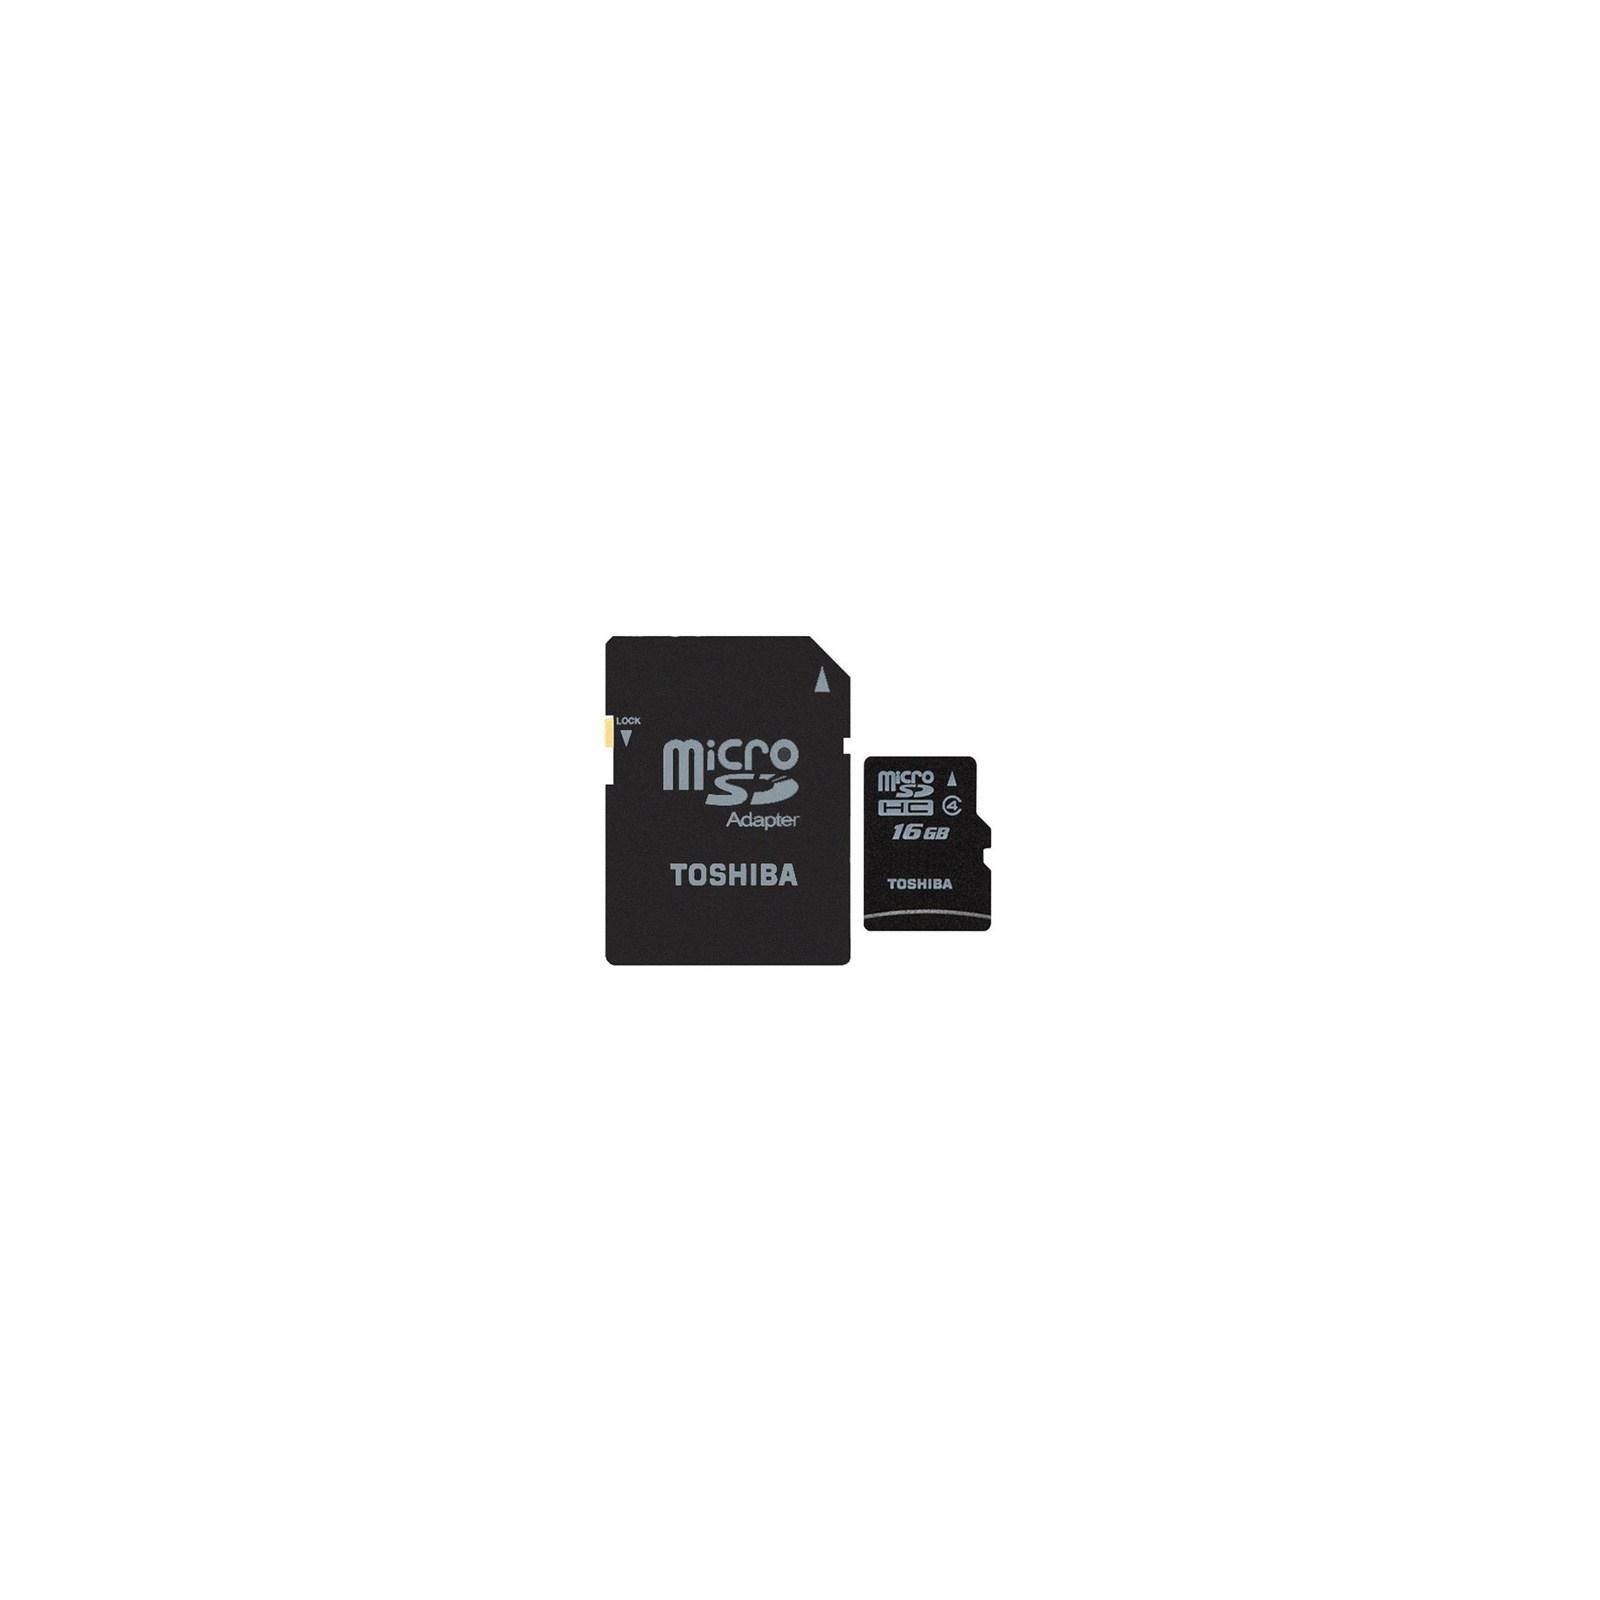 Карта памяти TOSHIBA 16Gb microSDHC class 4 (SD-C16GJ(BL5A)